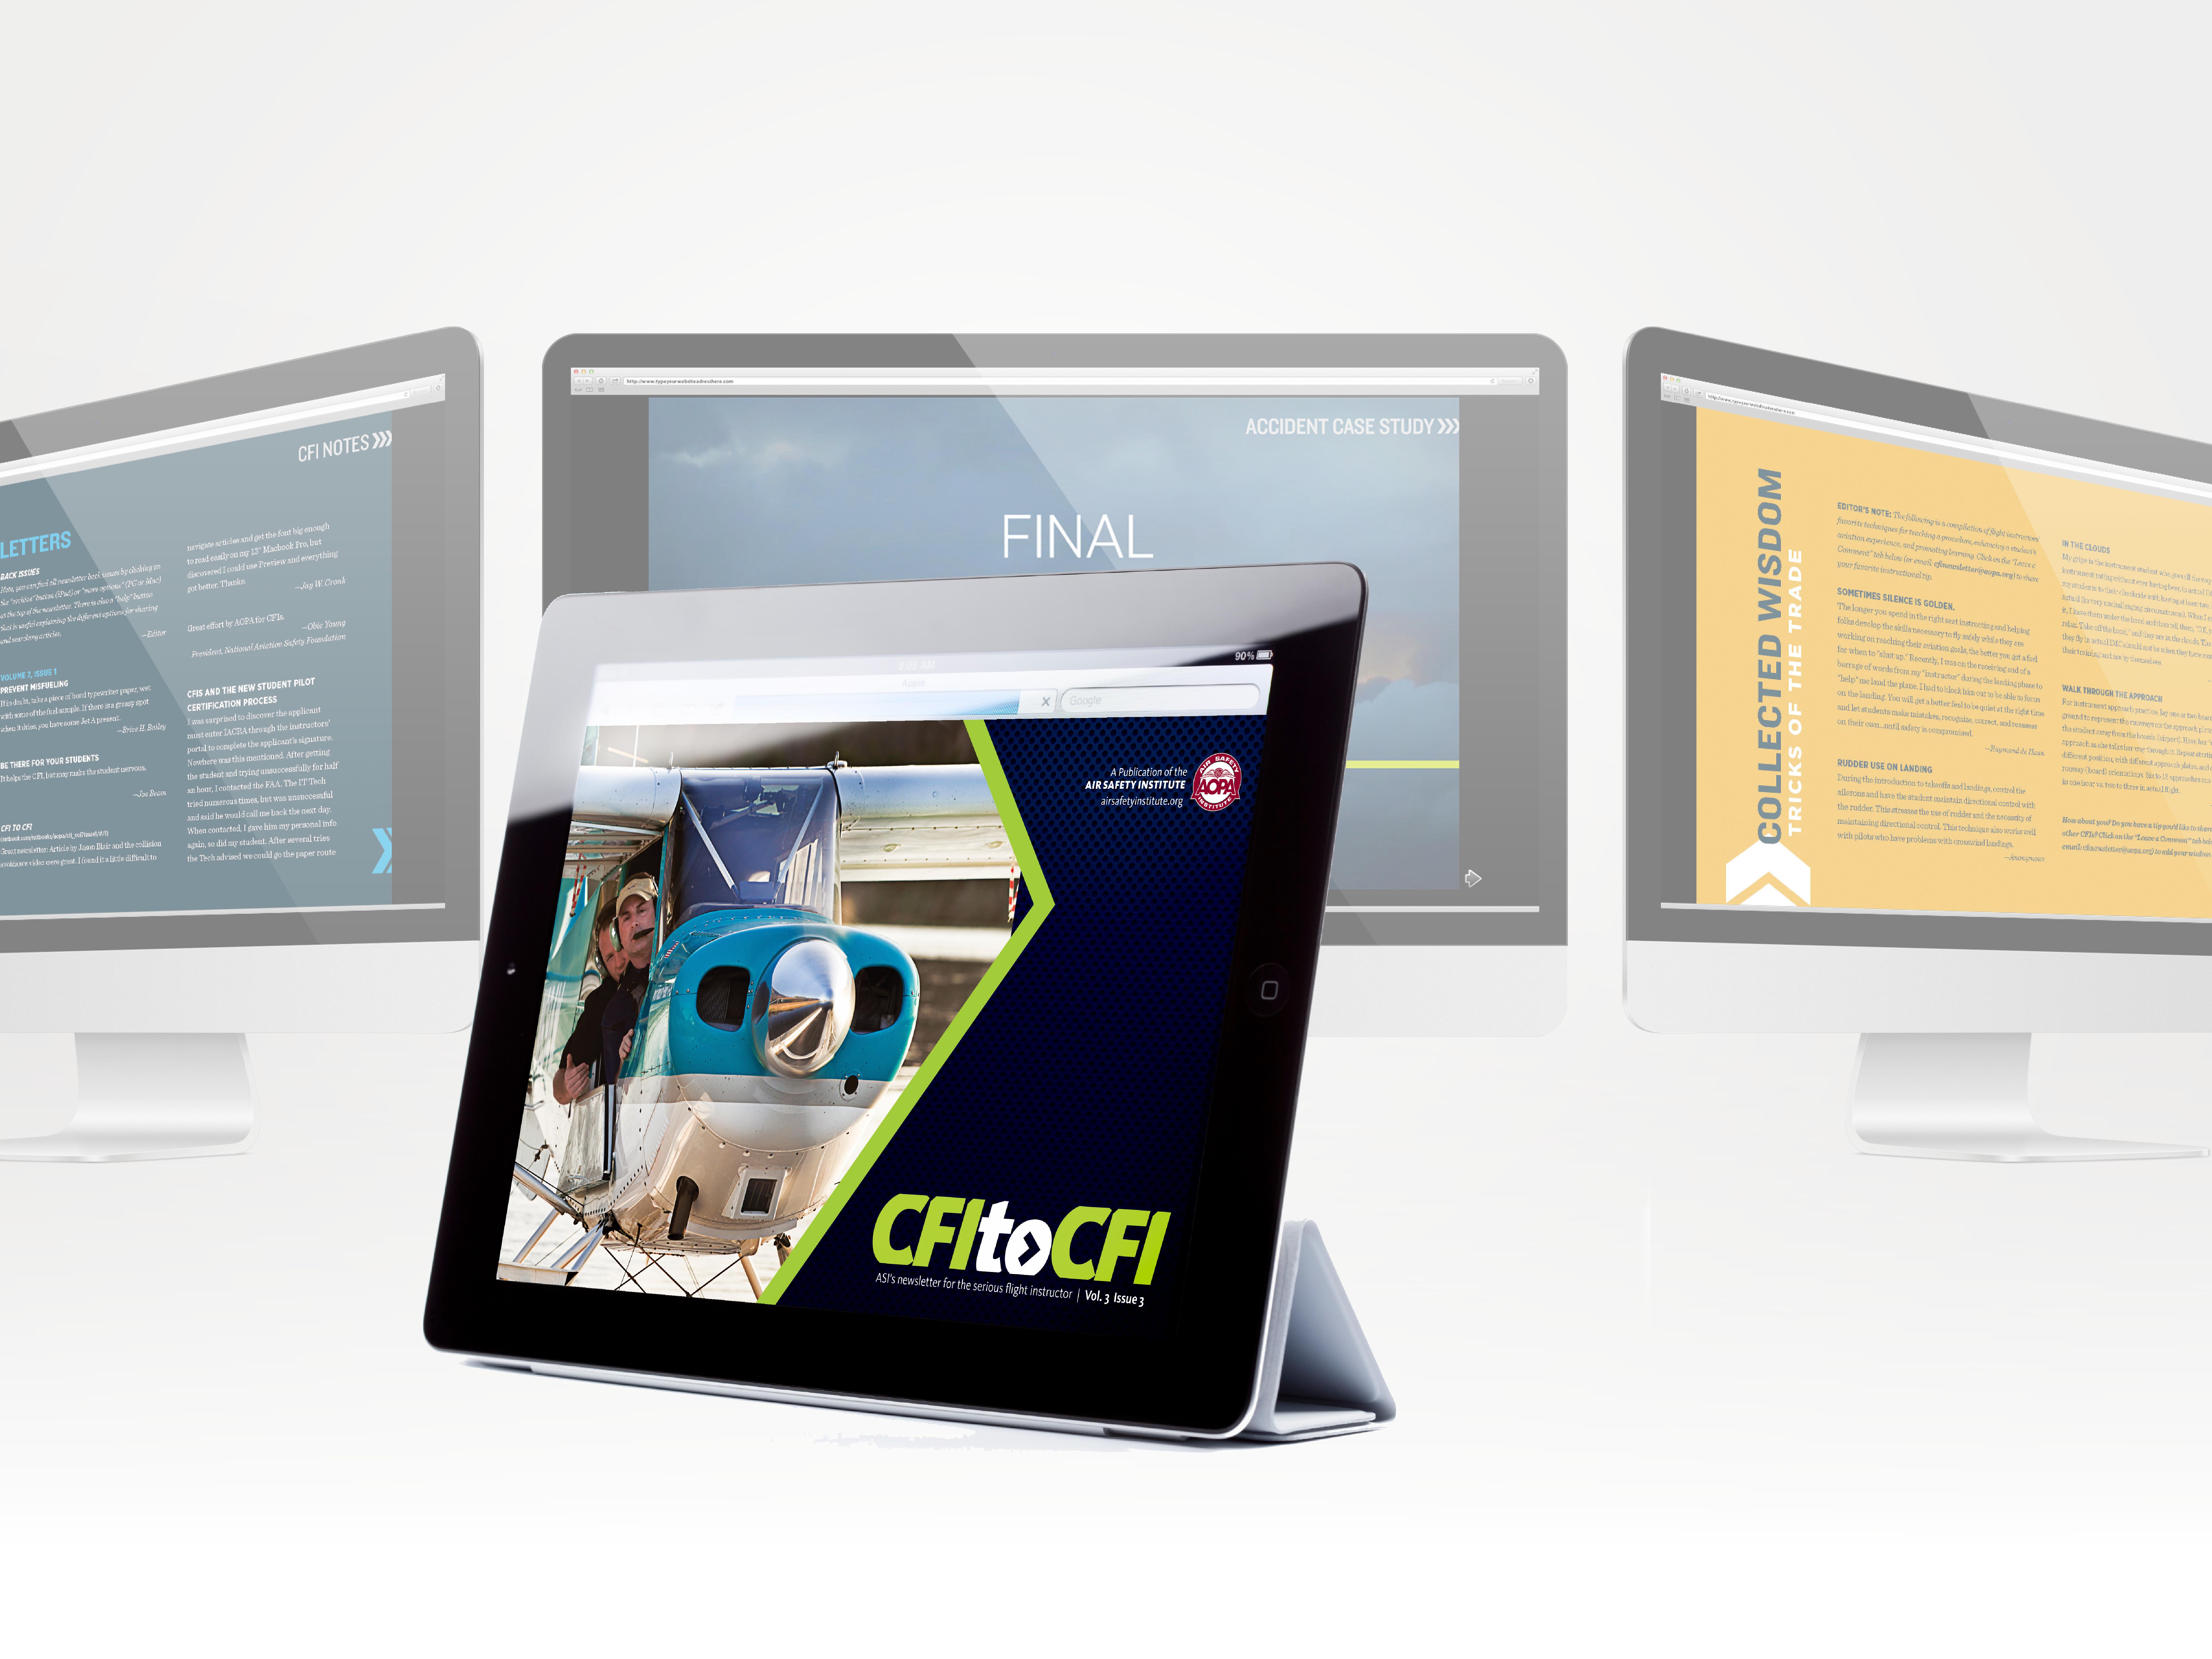 CFI-to-CFI - Digital Publication